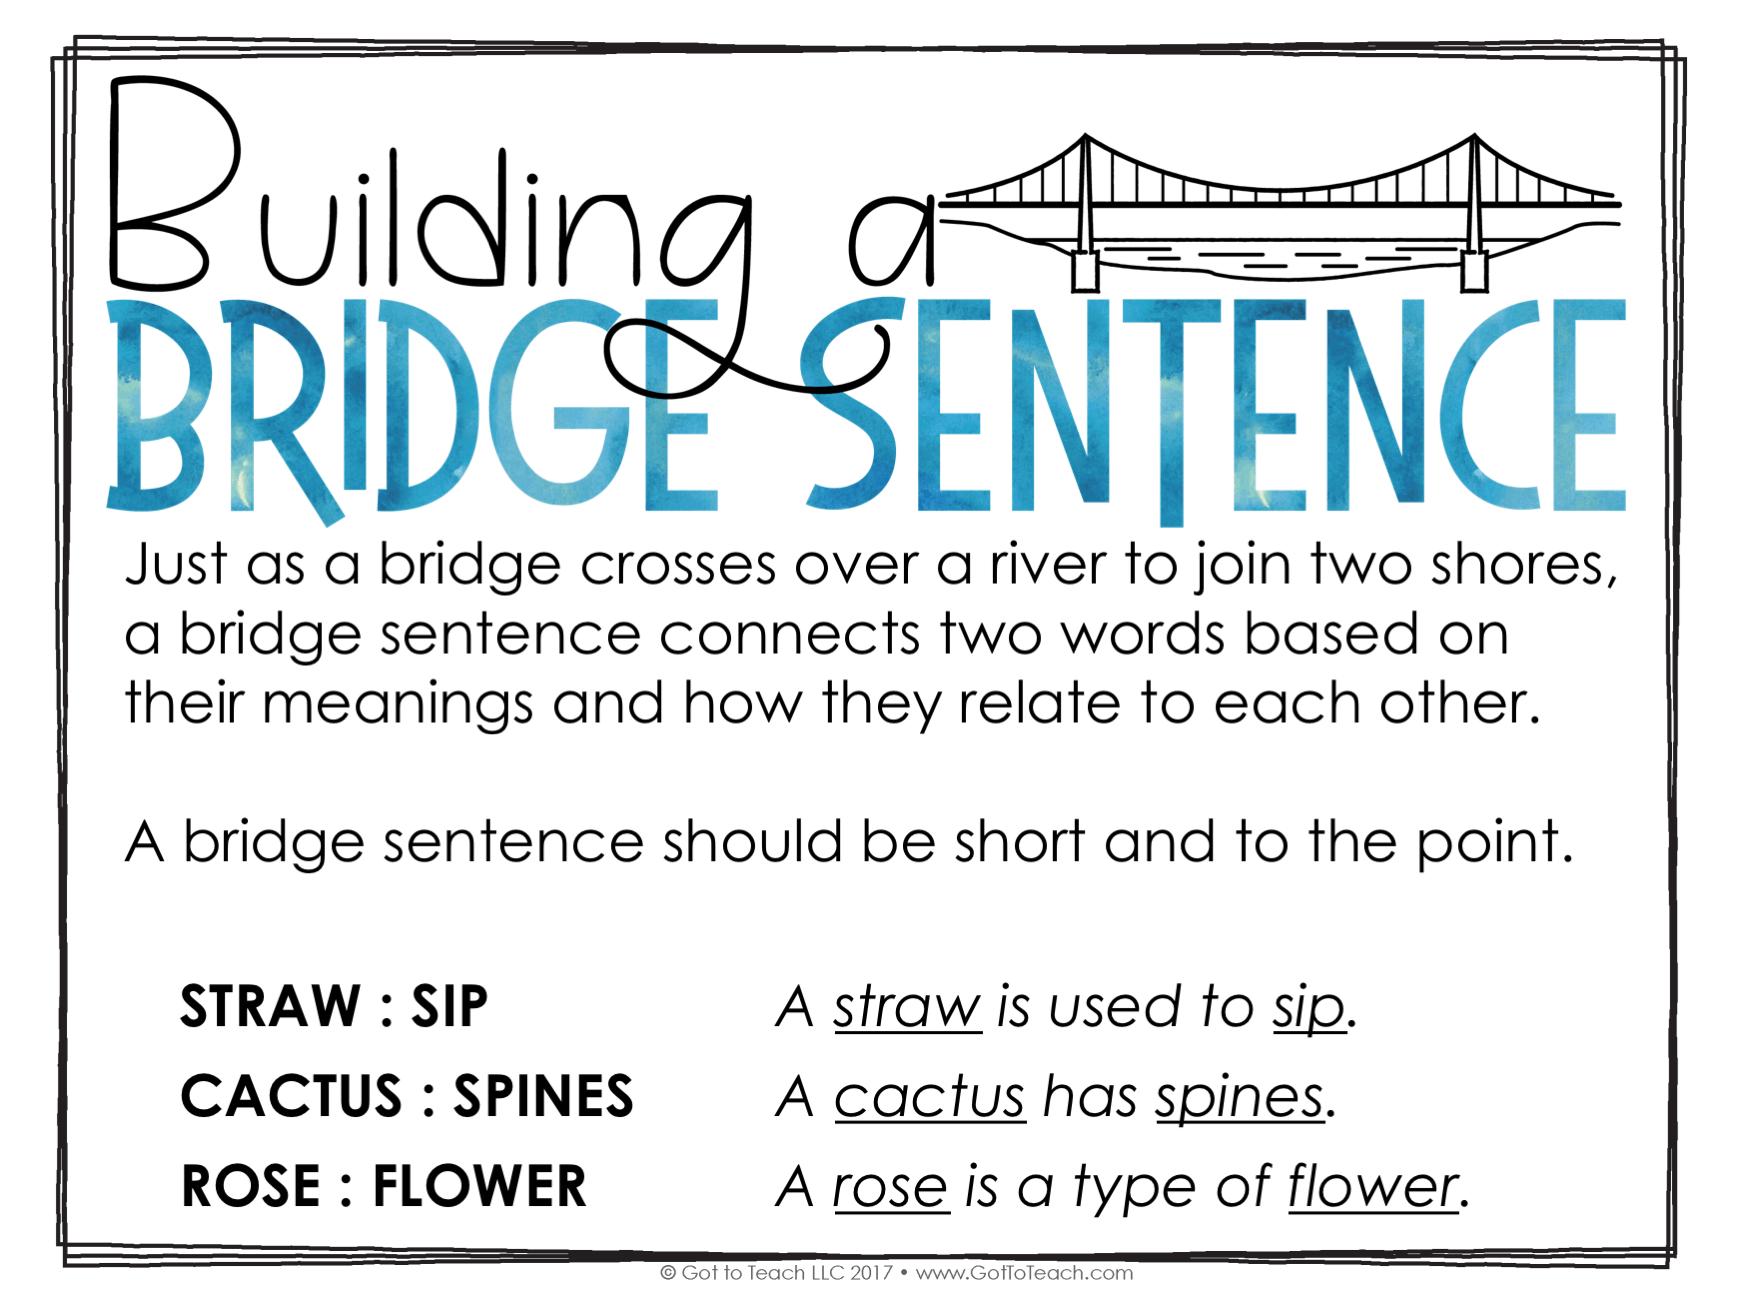 What Is a Bridge Statement in English Homework?